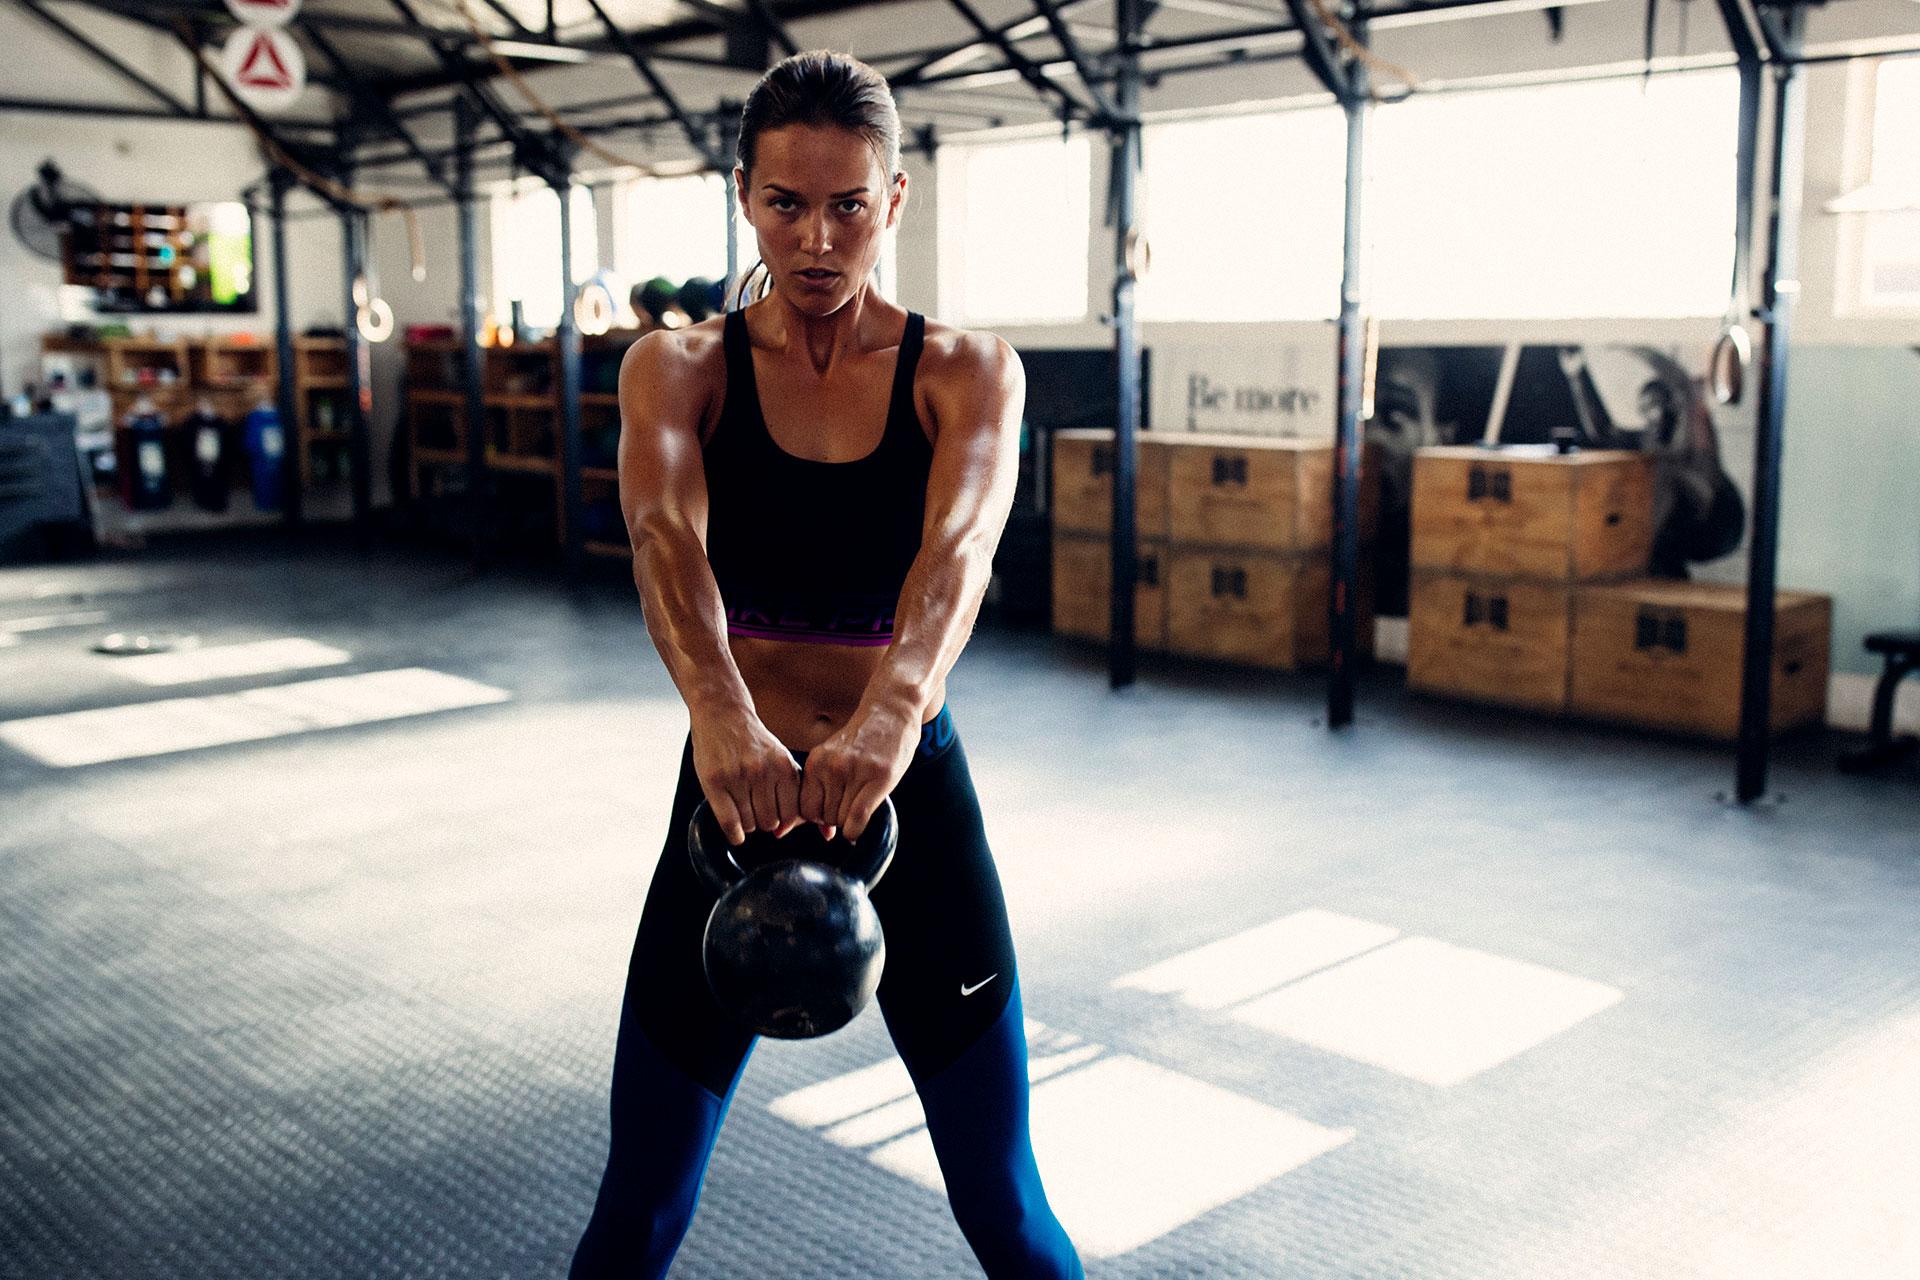 Muskeln Crossfit Frau Training Fotograf München Sport